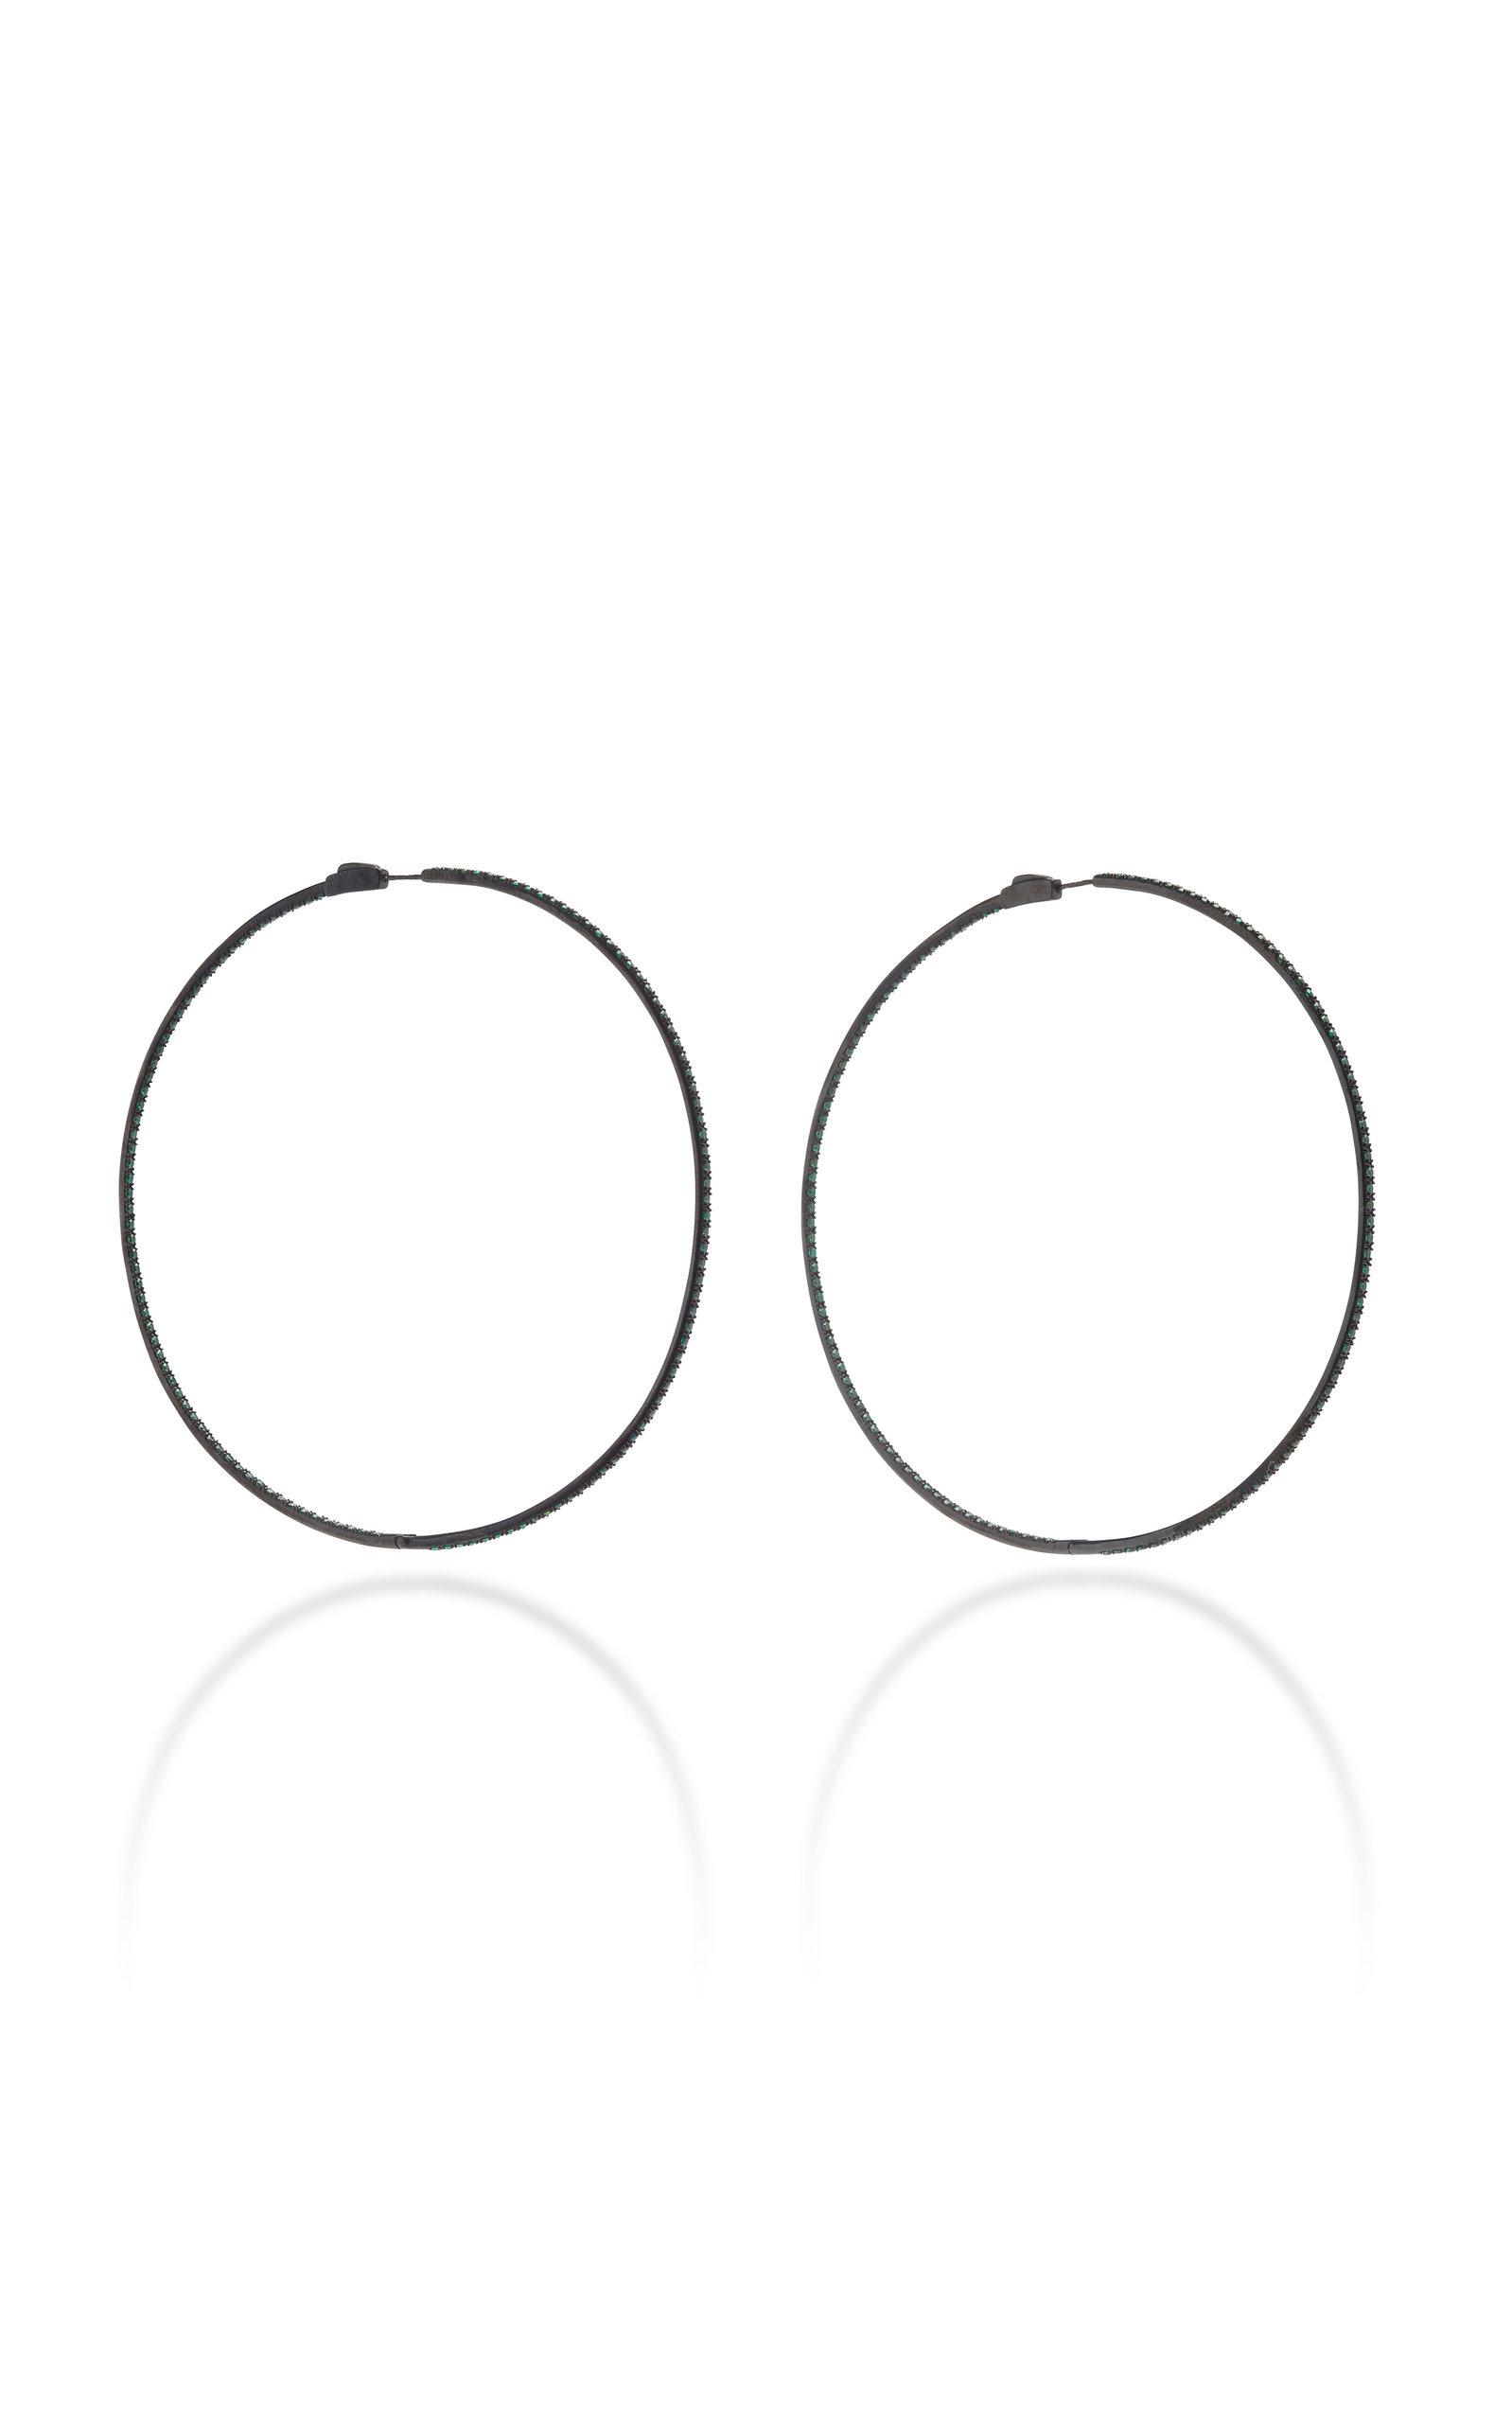 Women's Starlight Rhodium-Plated Sterling Silver And Tsavorite Hoop Earrings